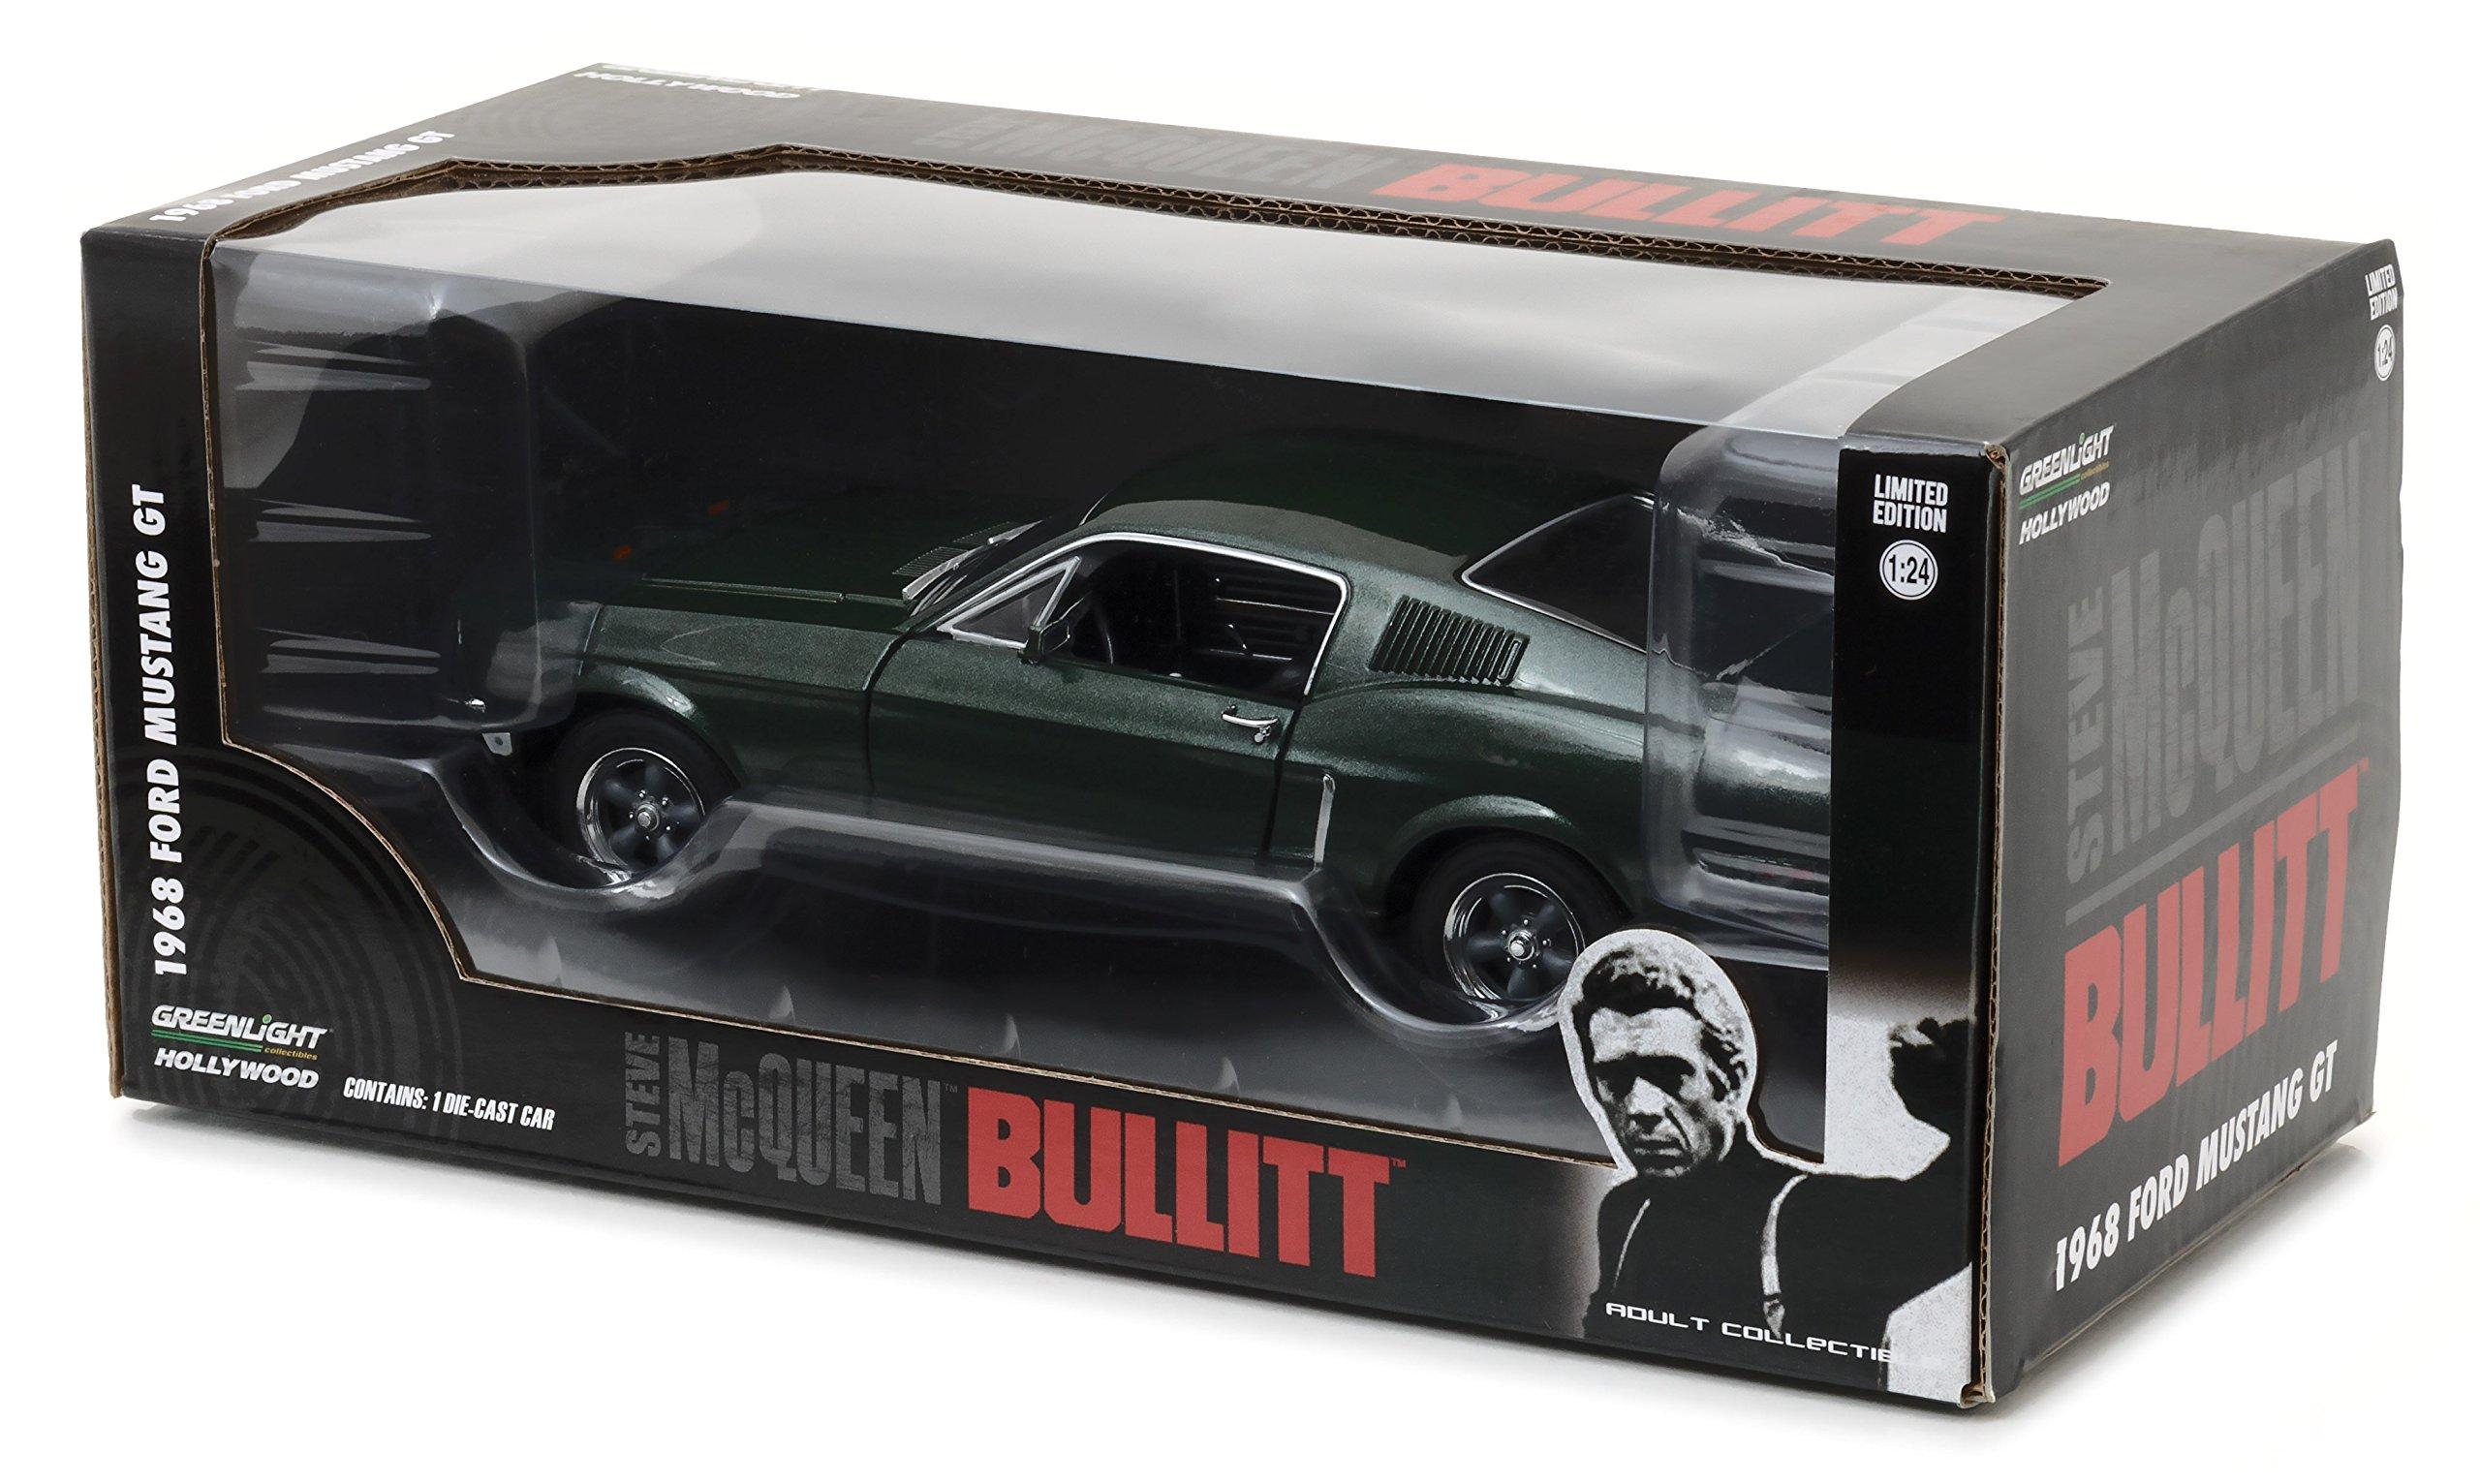 Greenlight - (1:24 Scale Bullitt (1968) - 1968 Ford Mustang GT Fastback - 84041 by Greenlight (Image #2)